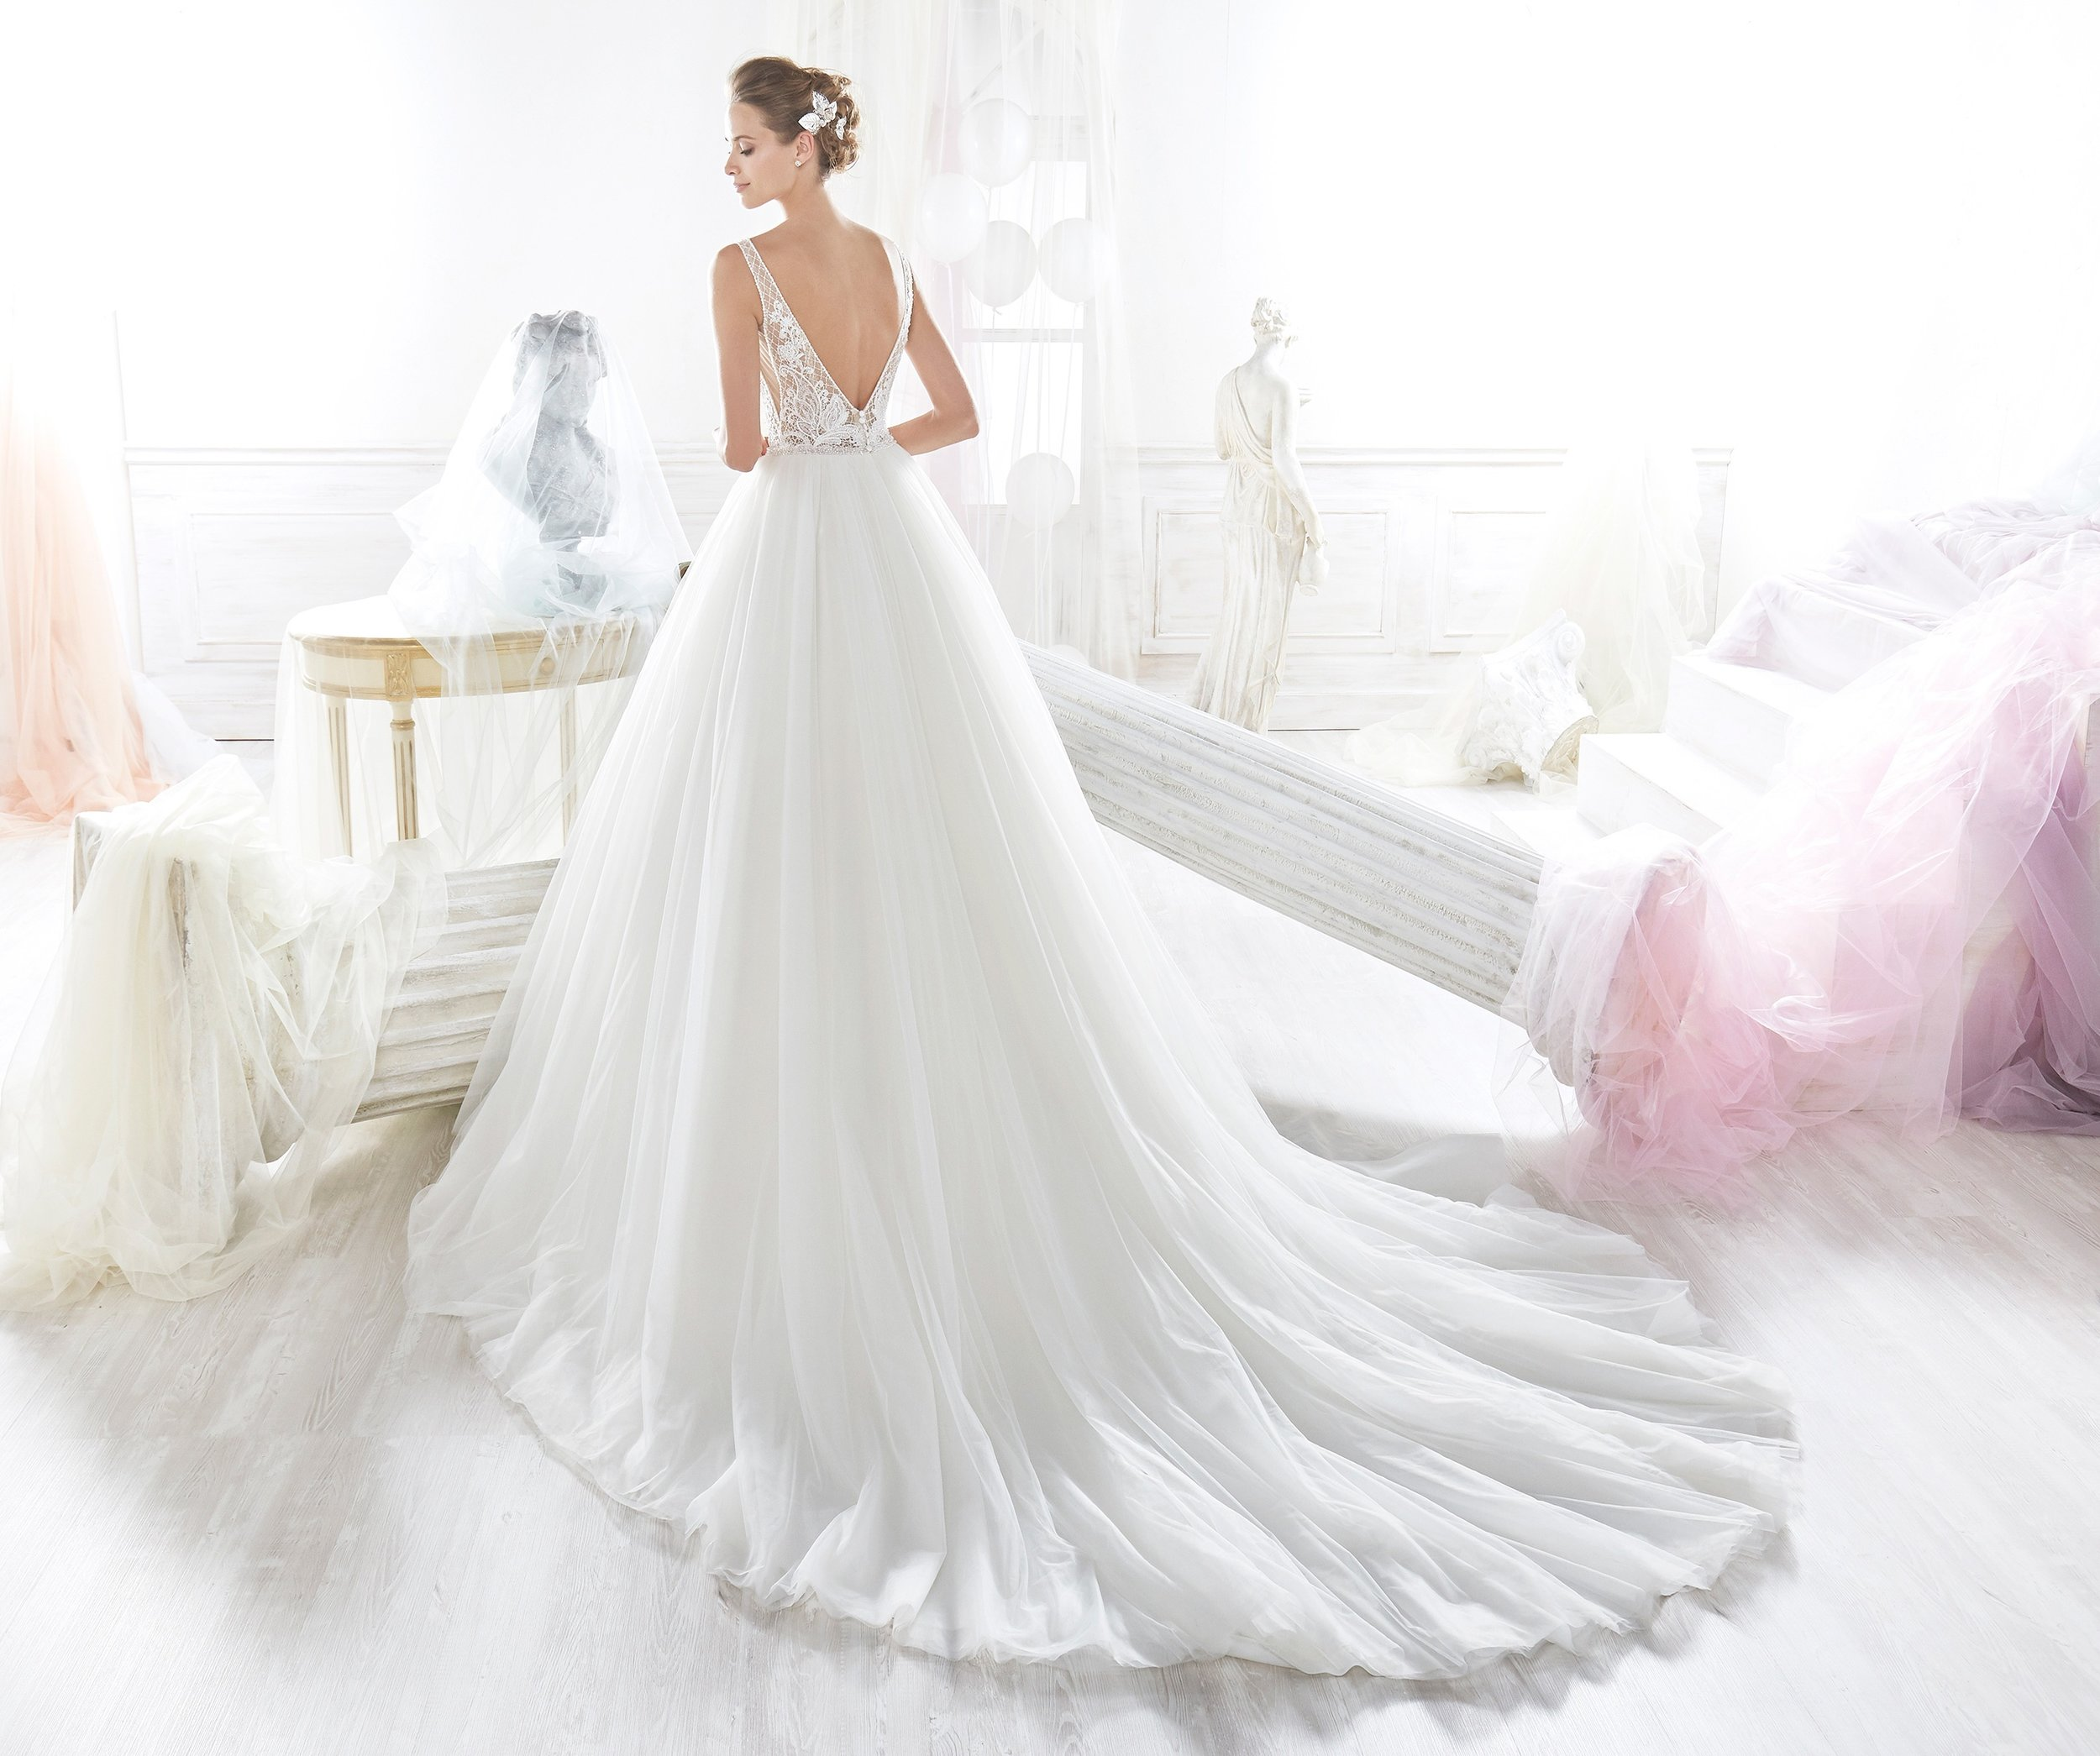 nicole-spose-NIAB18009-Nicole-moda-sposa-2018-94.jpg